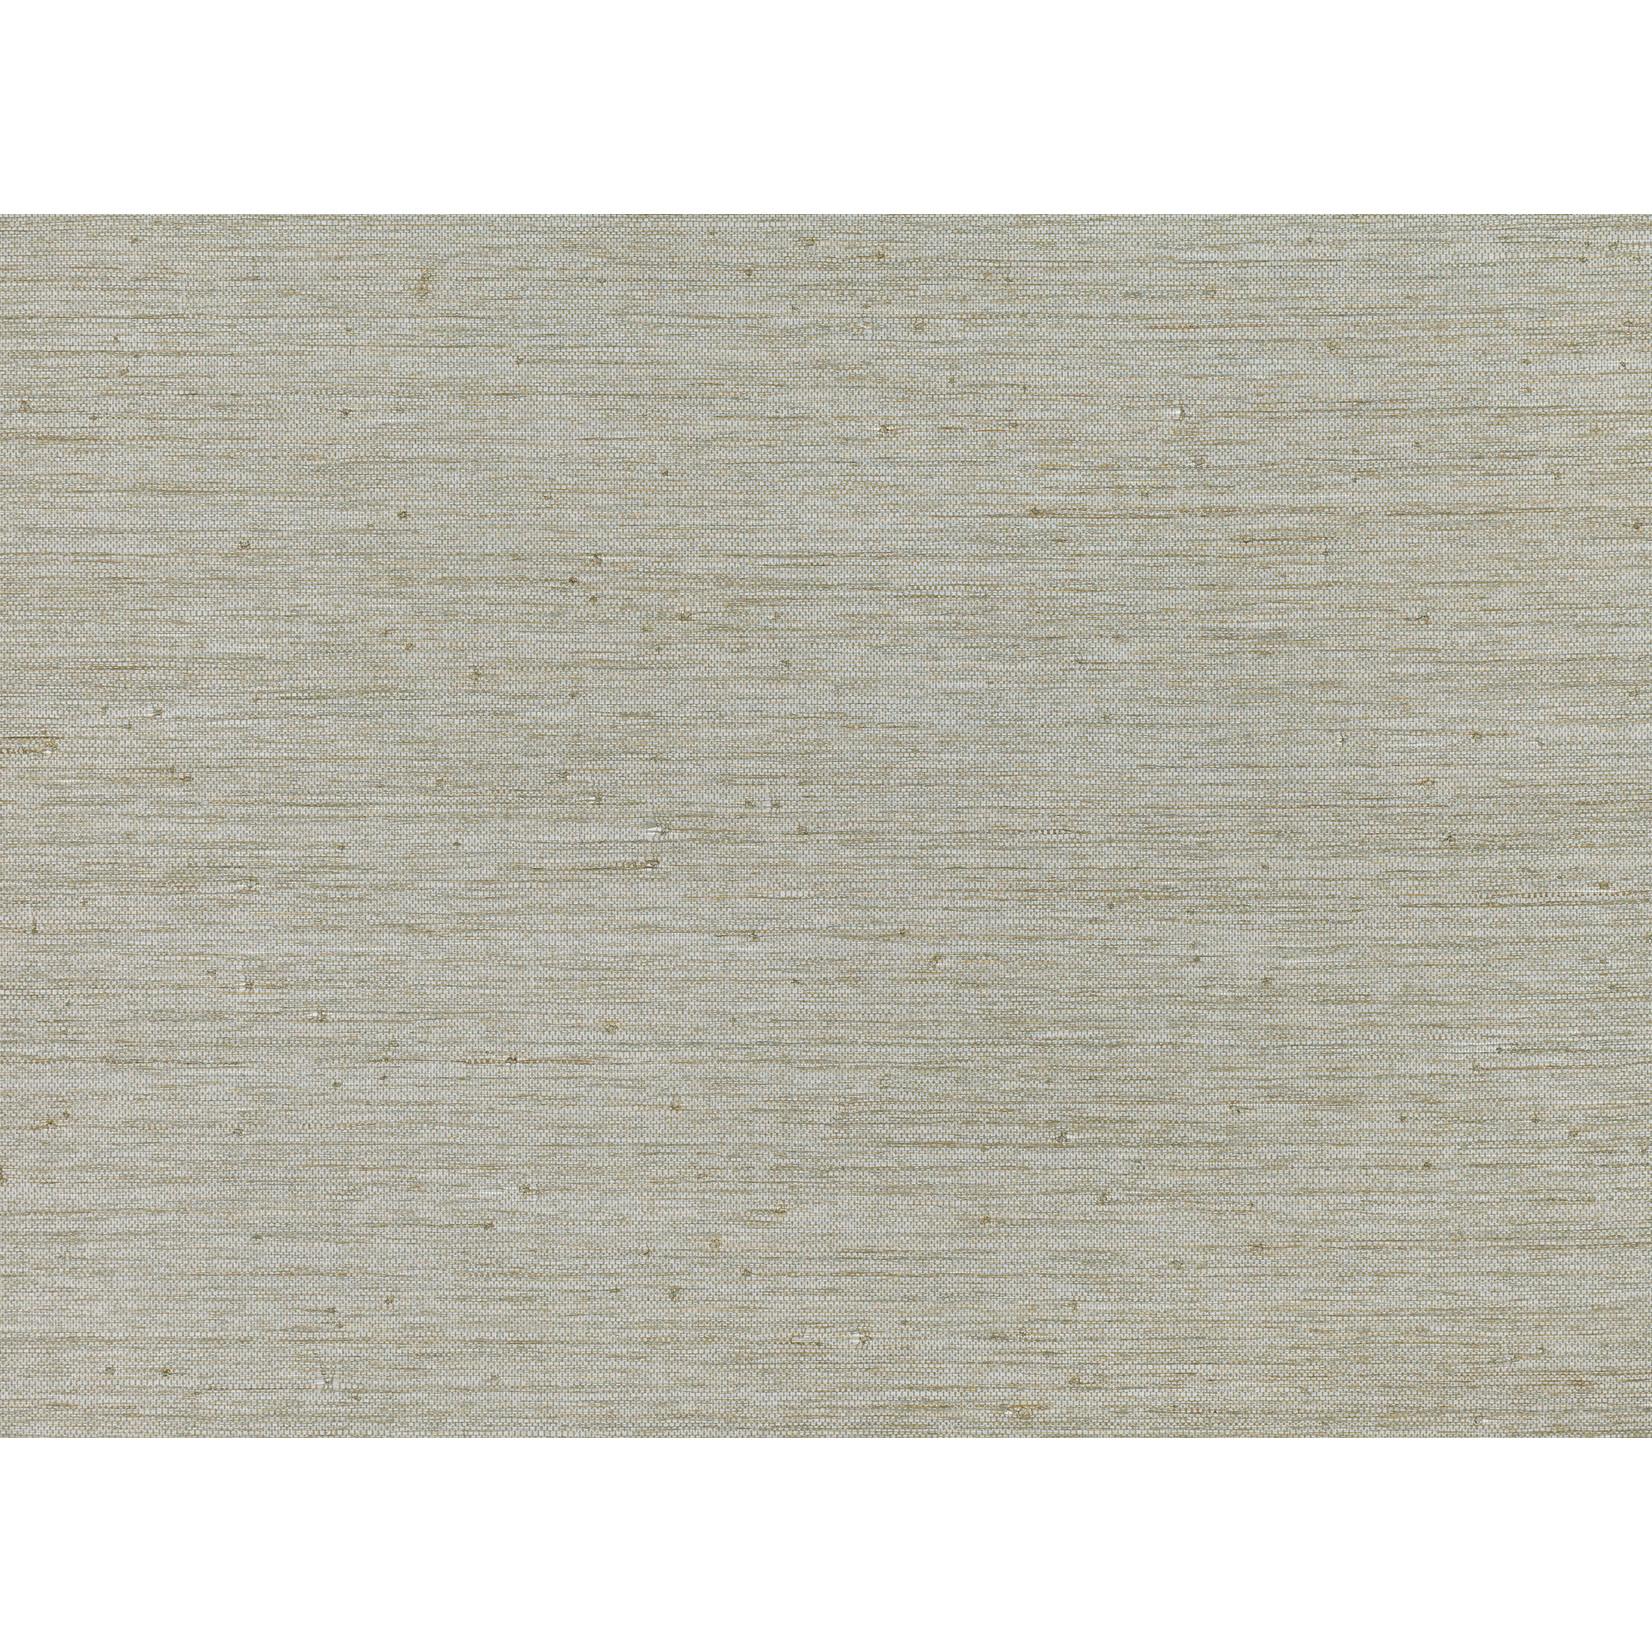 Mark Alexander Grasscloth Handwoven Wallcoverings | Raffia Sepia